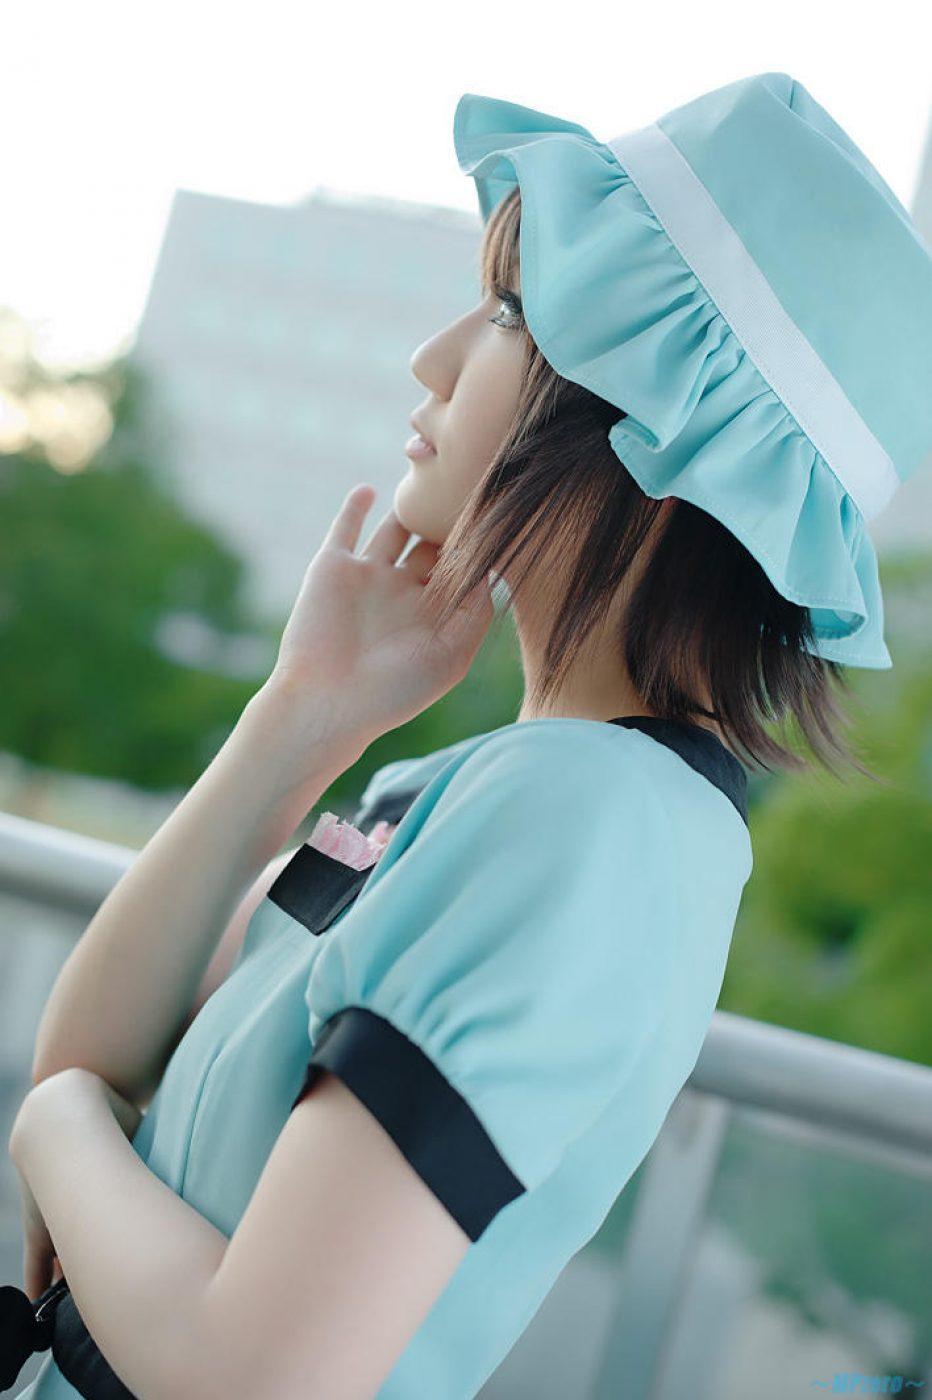 SteinsGate-Shiina-Mayuri-Cosplay-Gamers-Heroes-3.jpg